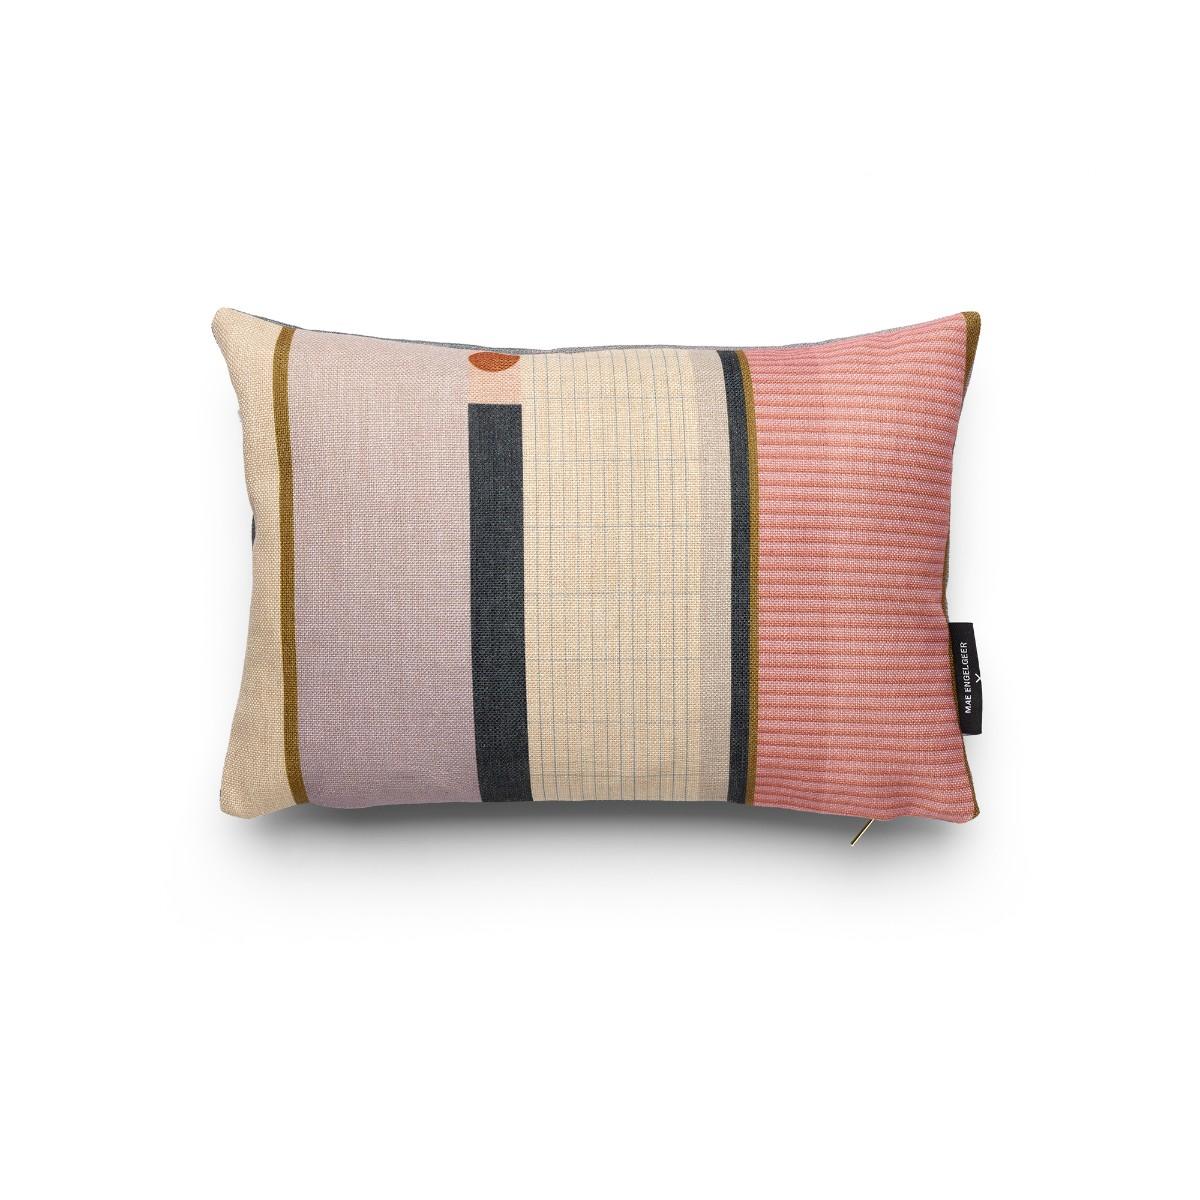 Fest I Line Cushion (M. ENGELGEER) 45x30cm